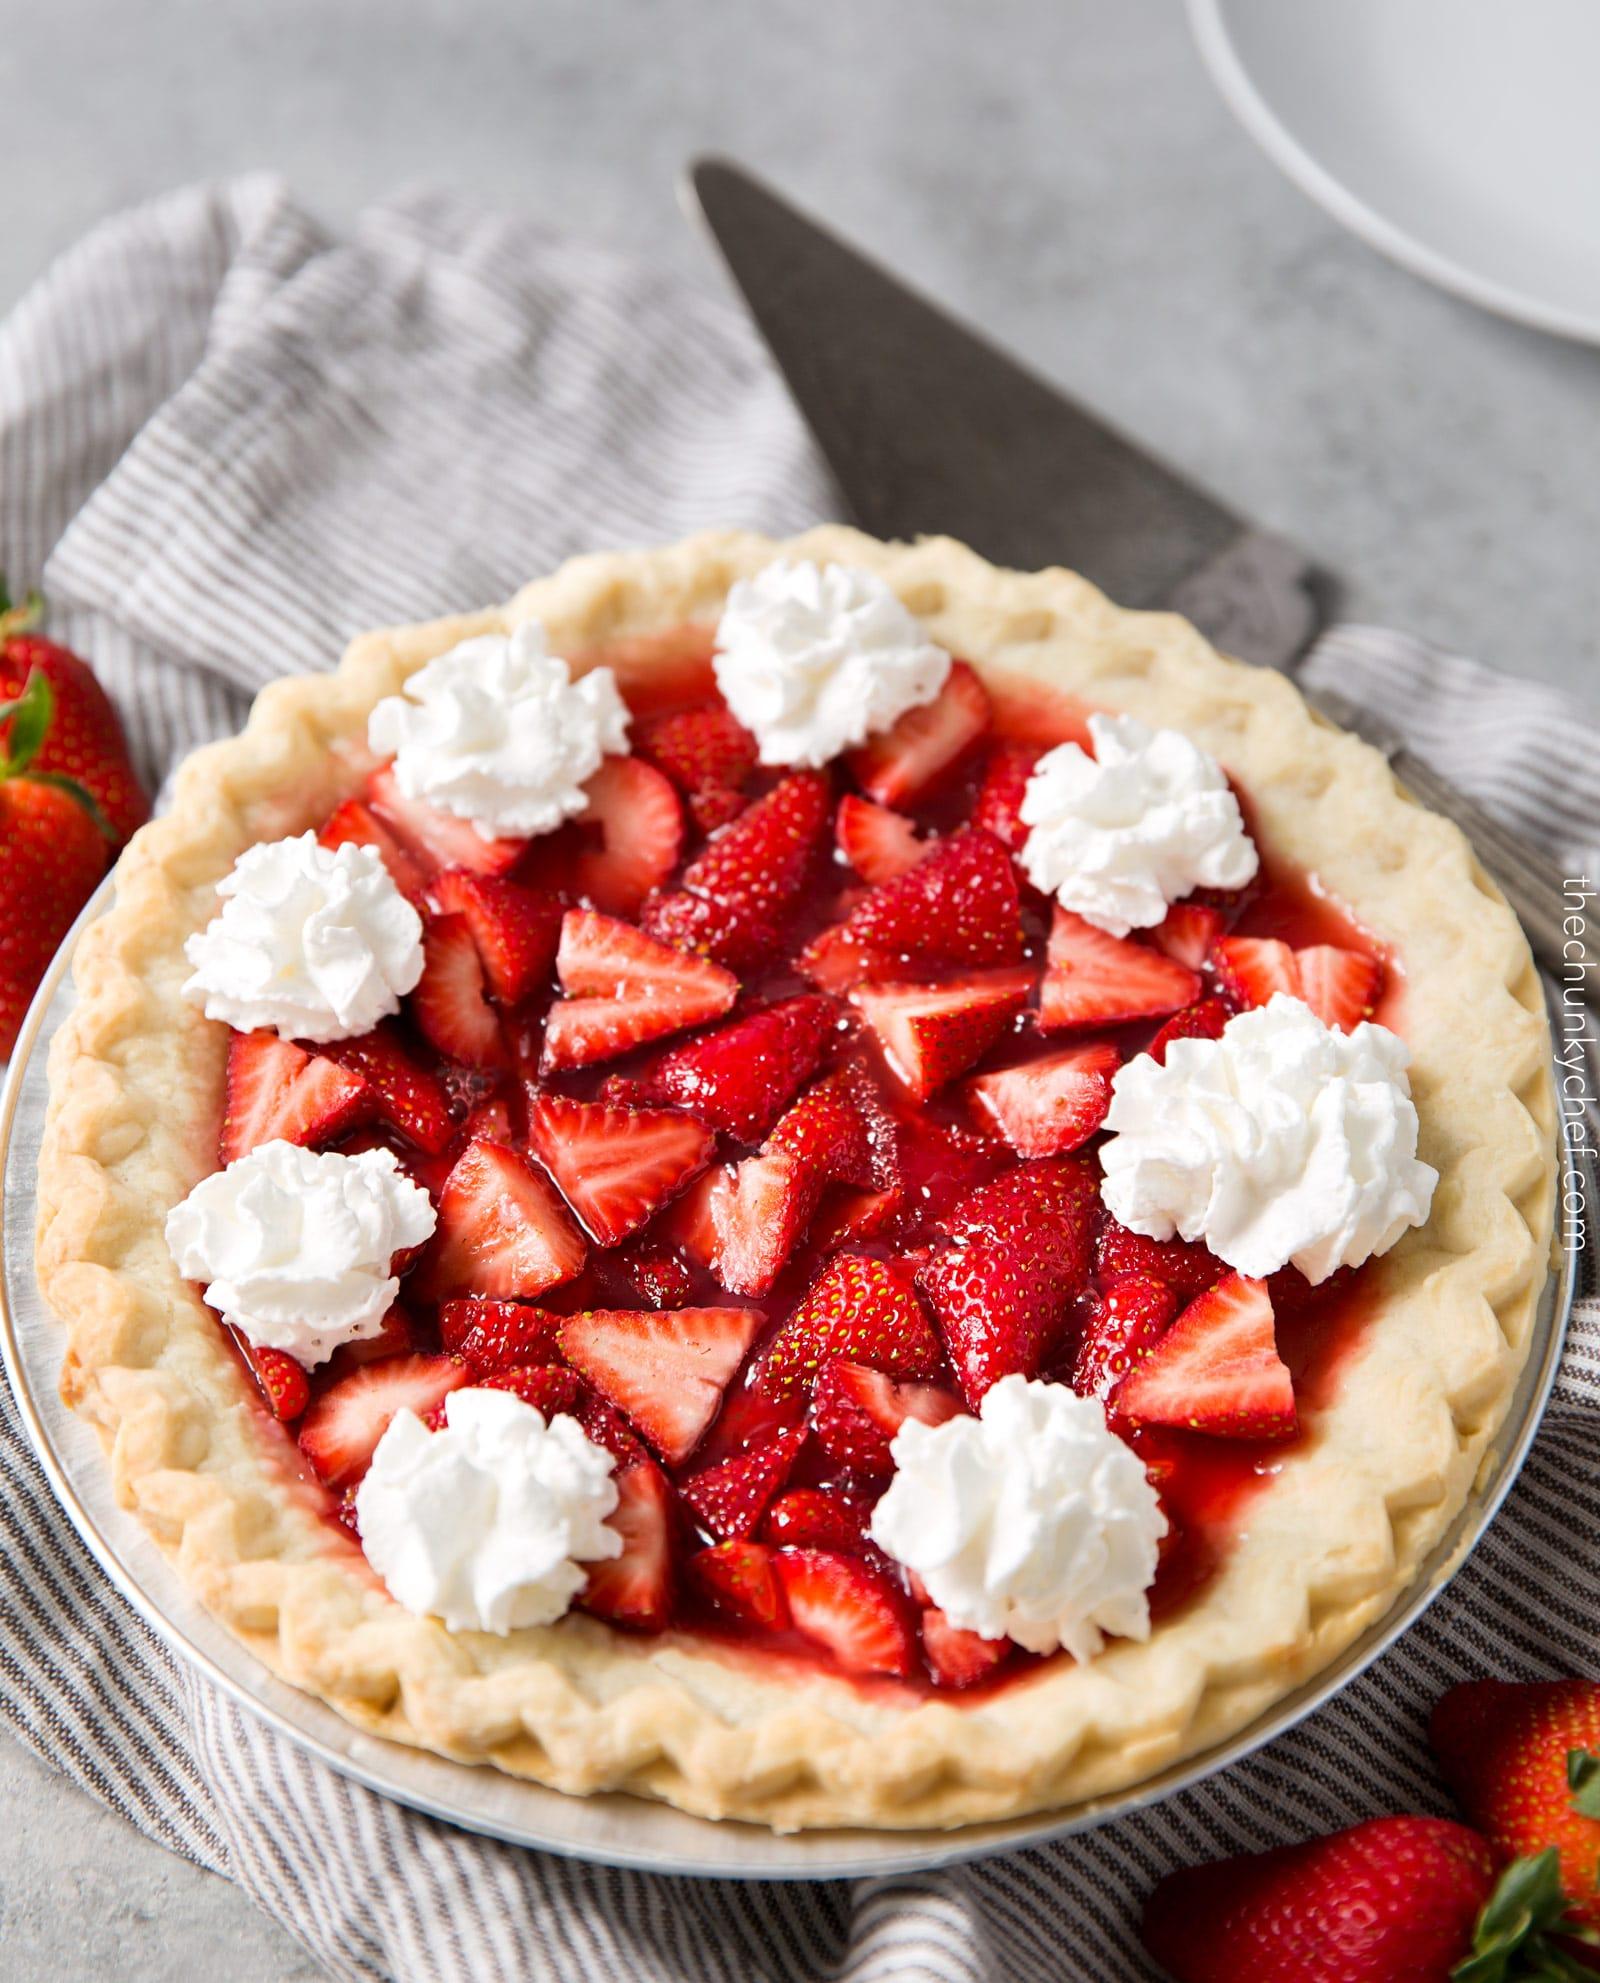 Copycat Frisch's Big Boy Fresh Strawberry Pie - The Chunky Chef